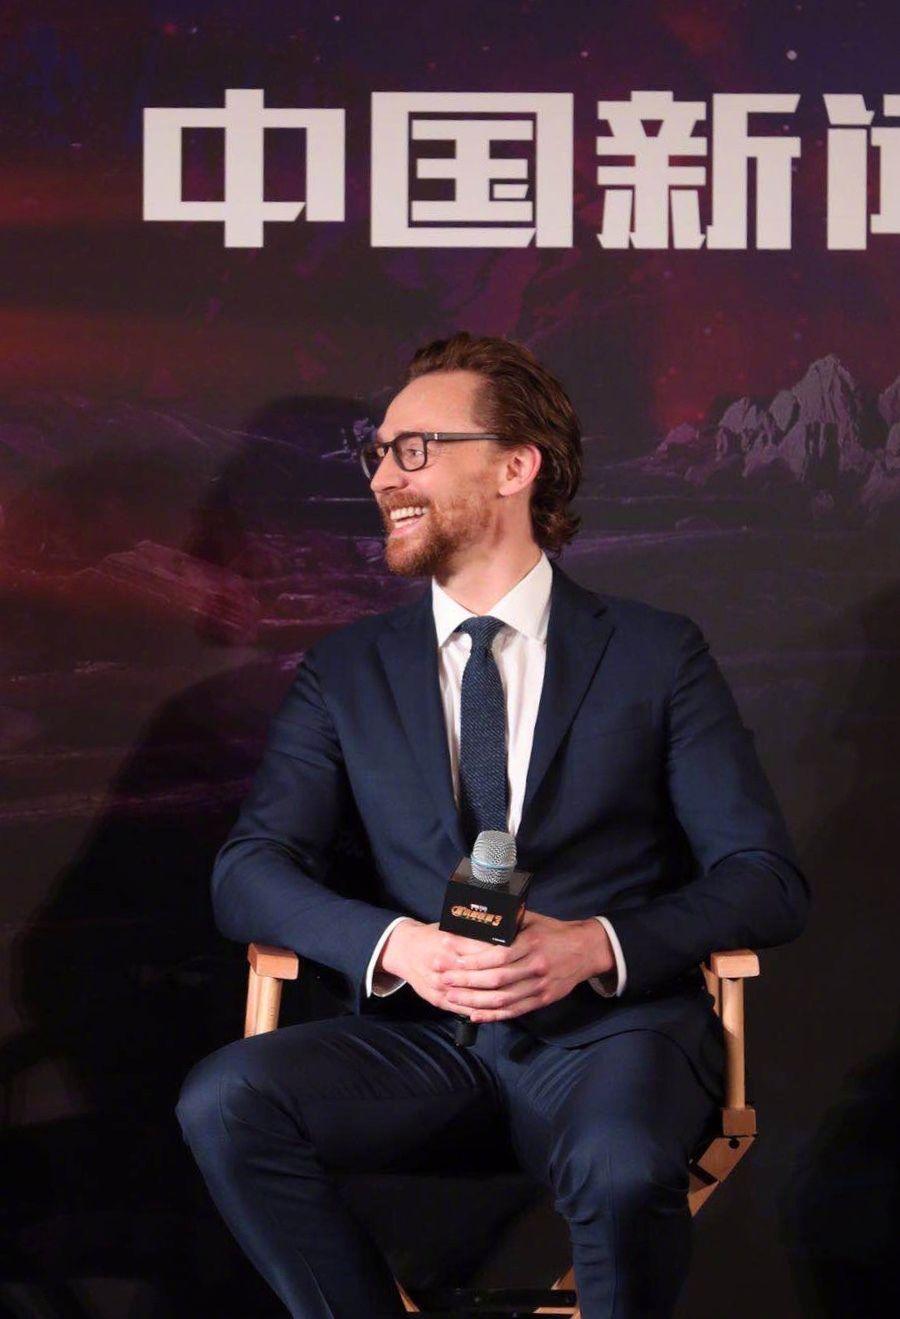 9c3bab8c6a3d48 Tom Hiddleston.  InfinityWar promo in Shanghai. April 19, 2018. Credit on  the image. Via Torrilla.